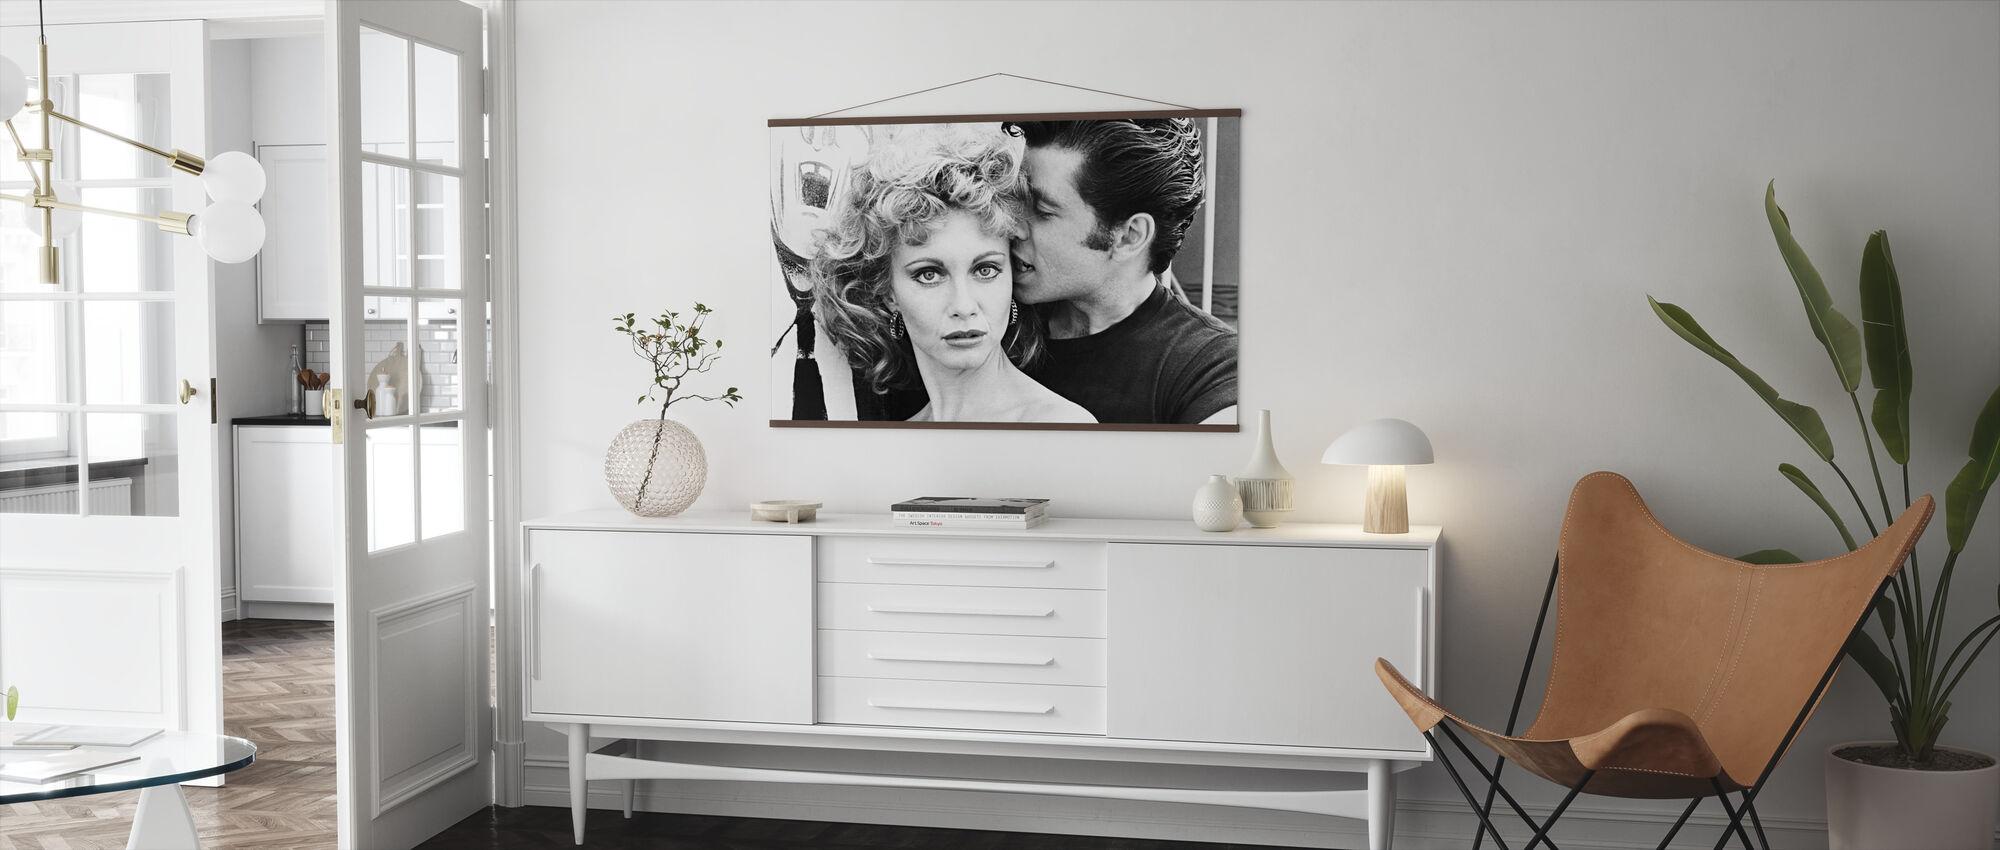 Vet - John Travolta en Olivia Newton John - Poster - Woonkamer